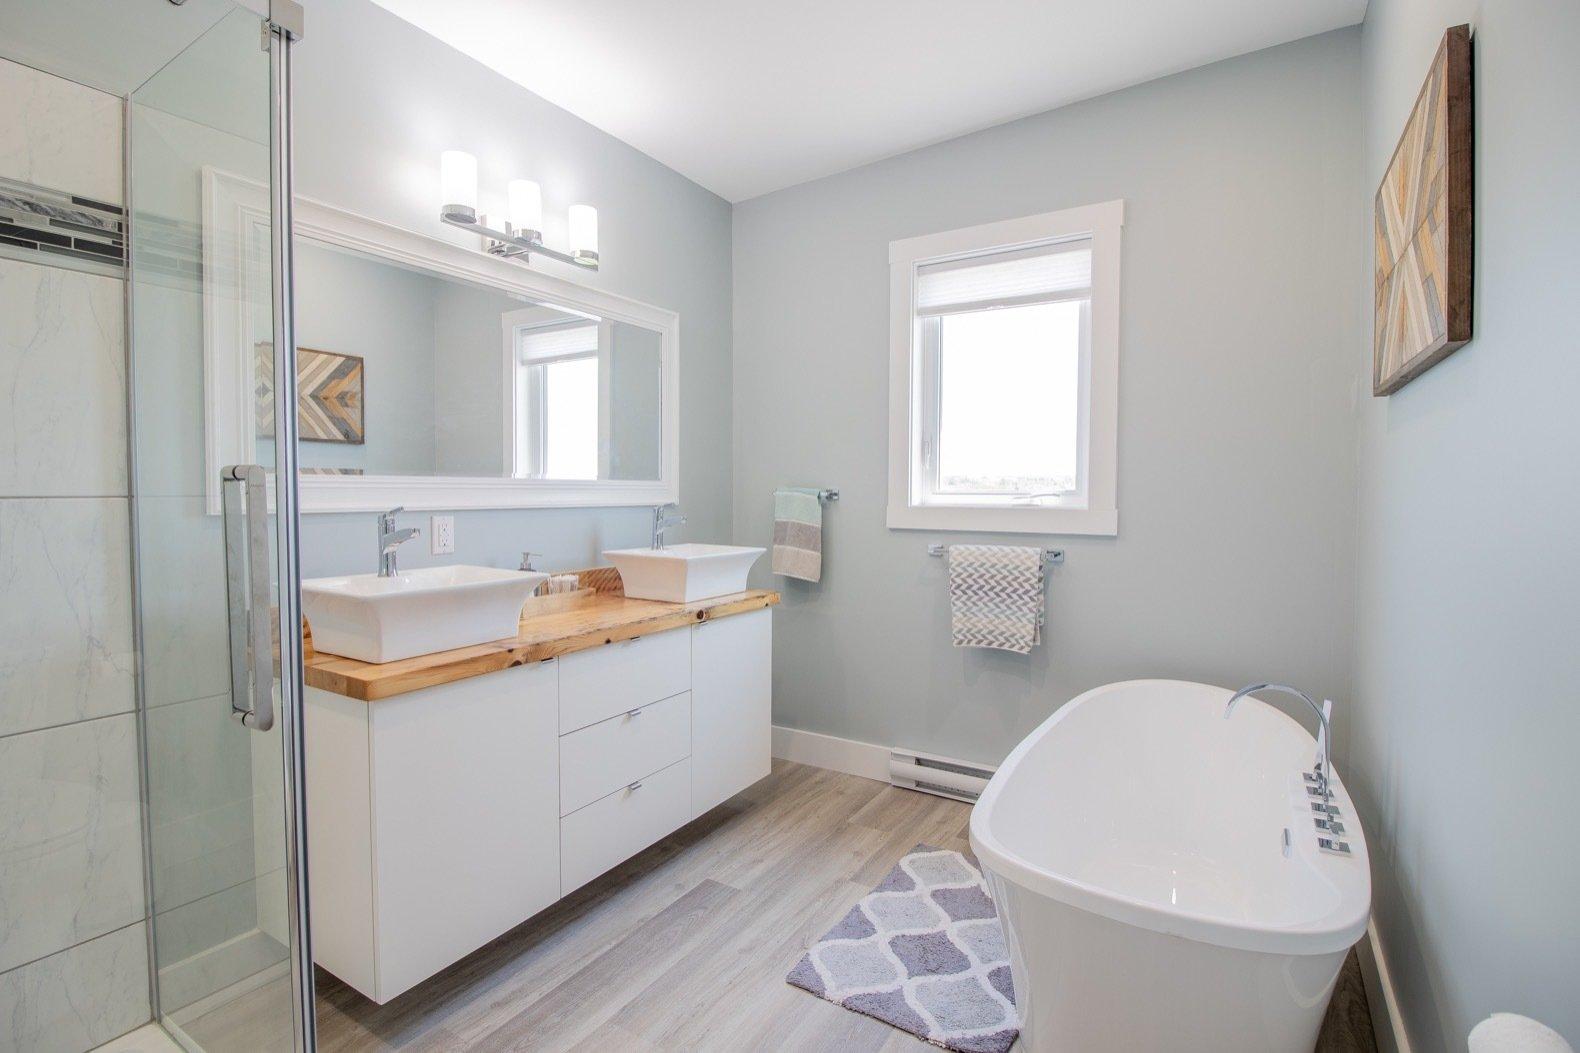 Recycle House bathroom